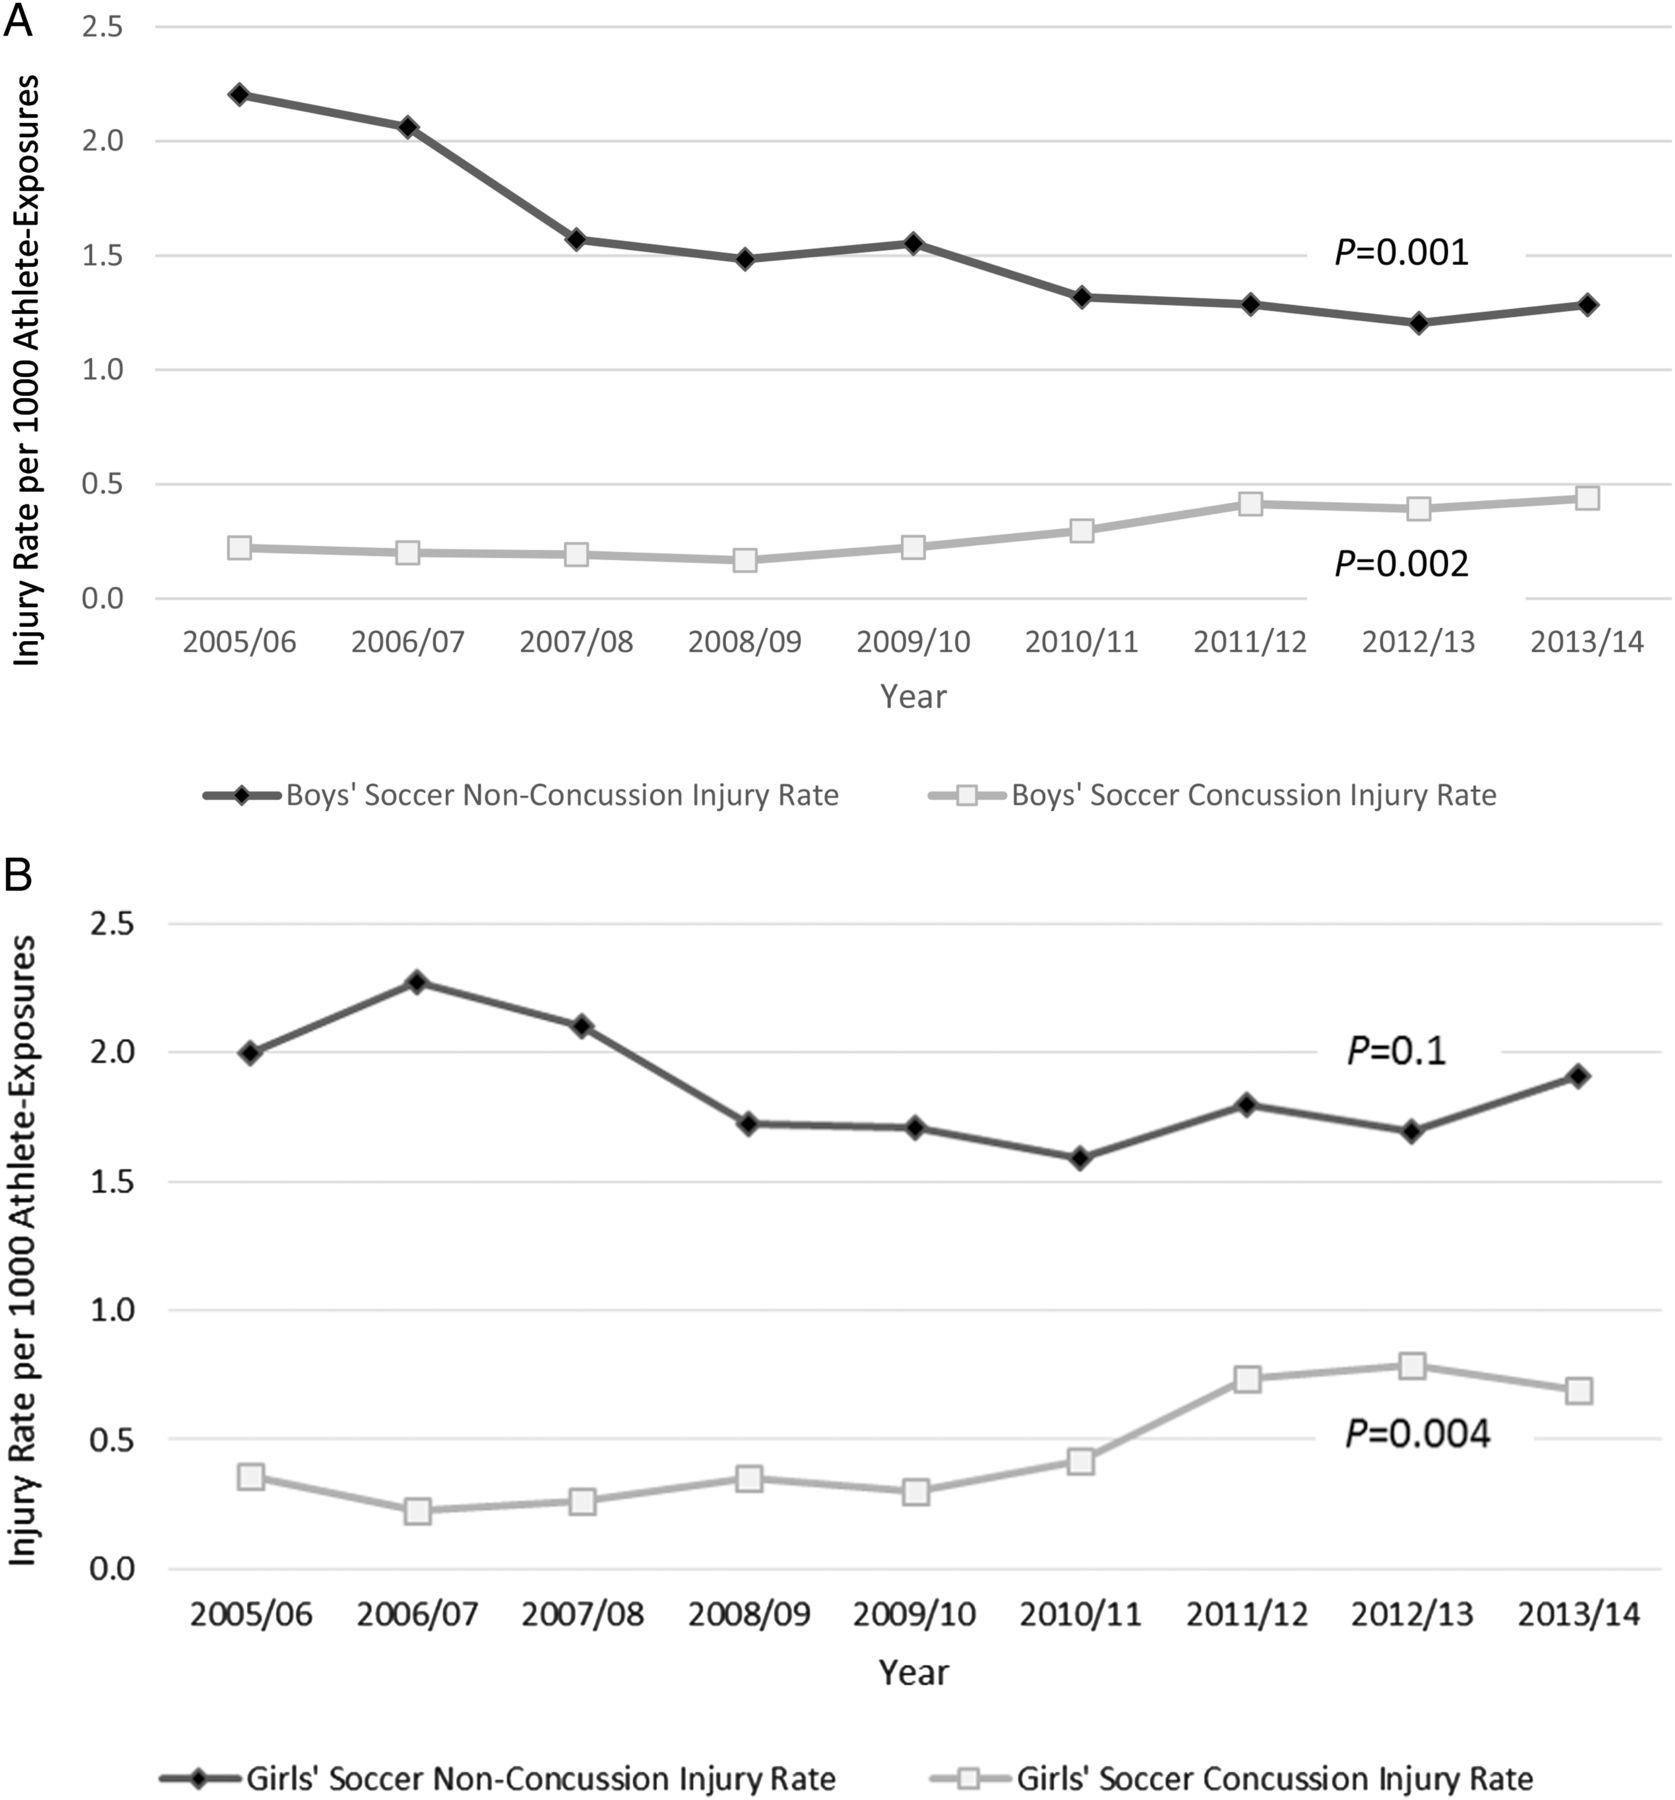 Nine-year study of US high school soccer injuries: data